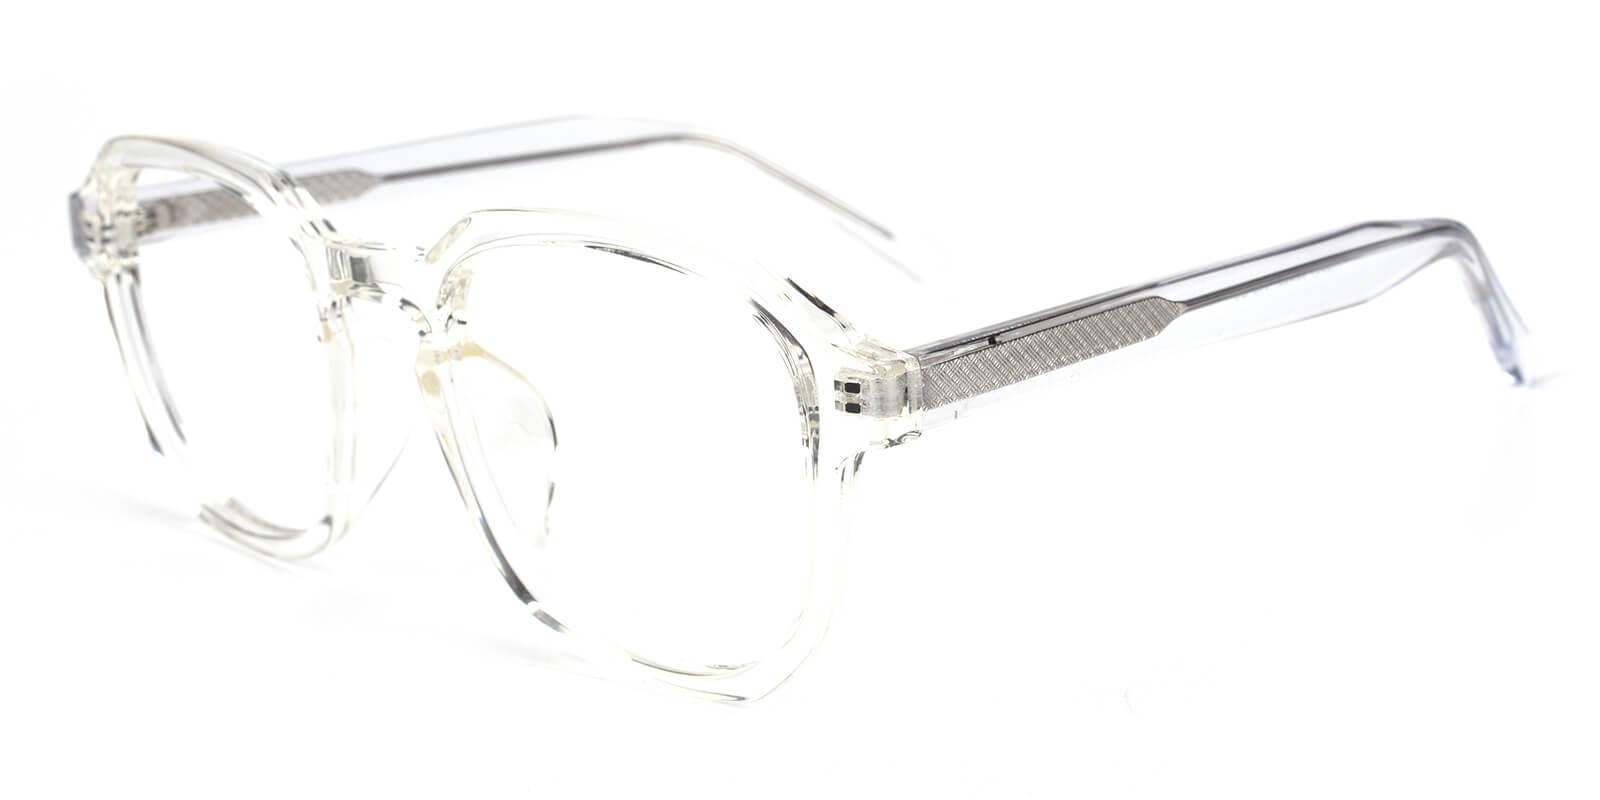 Emmar-Translucent-Square-Acetate-Eyeglasses-additional1